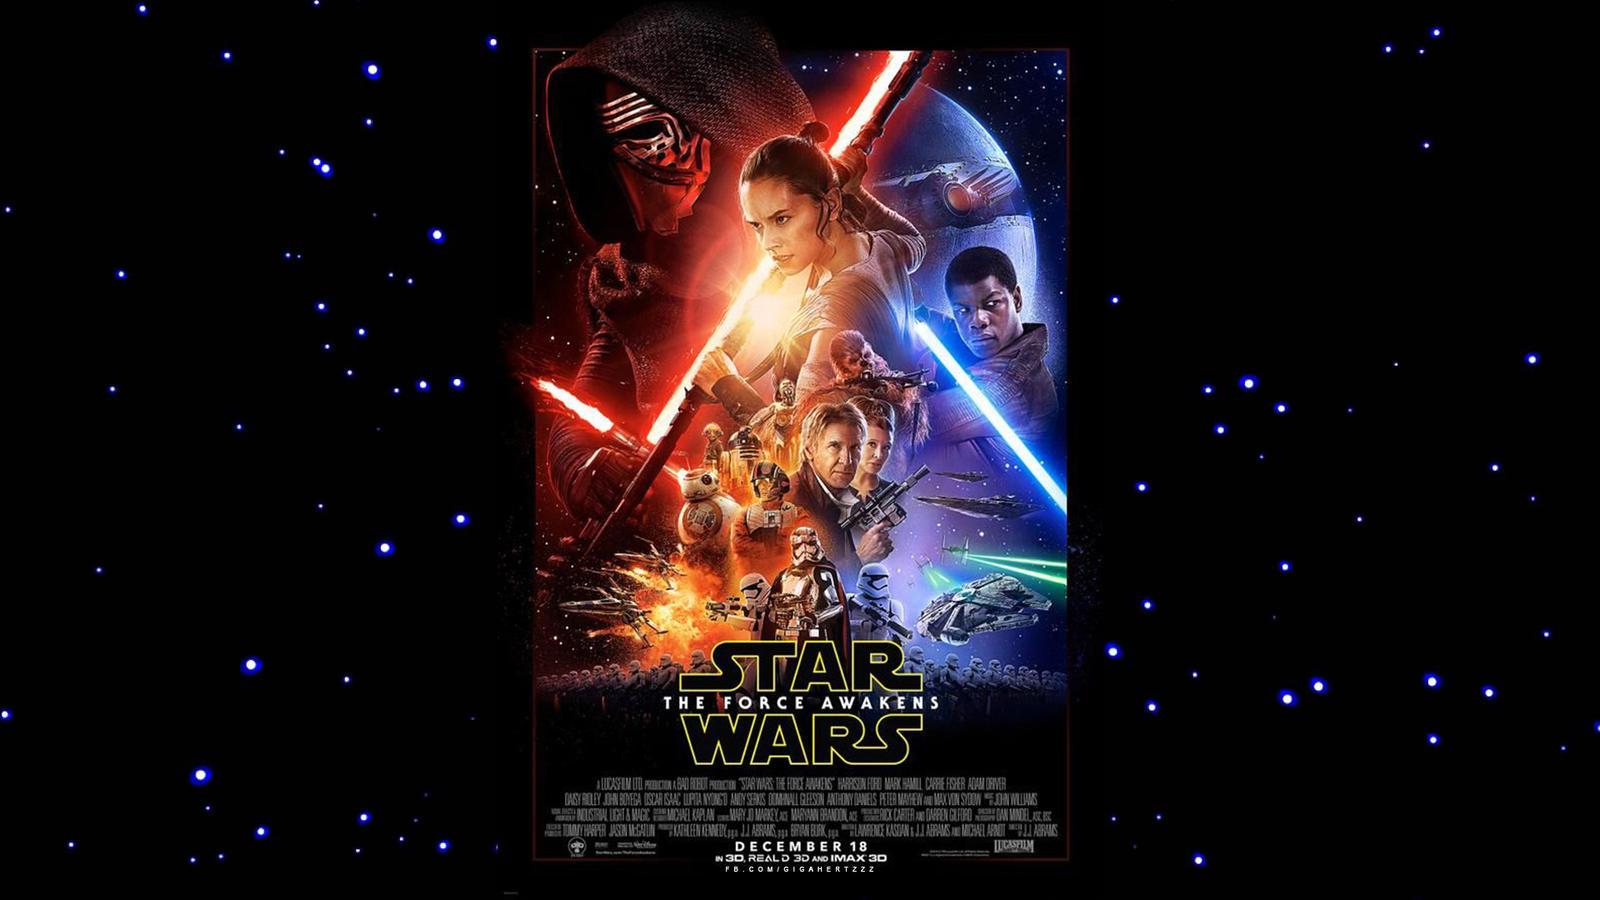 Star Wars The Force Awakens Wallpaper 1920 X 1080 By Gigahertzzz